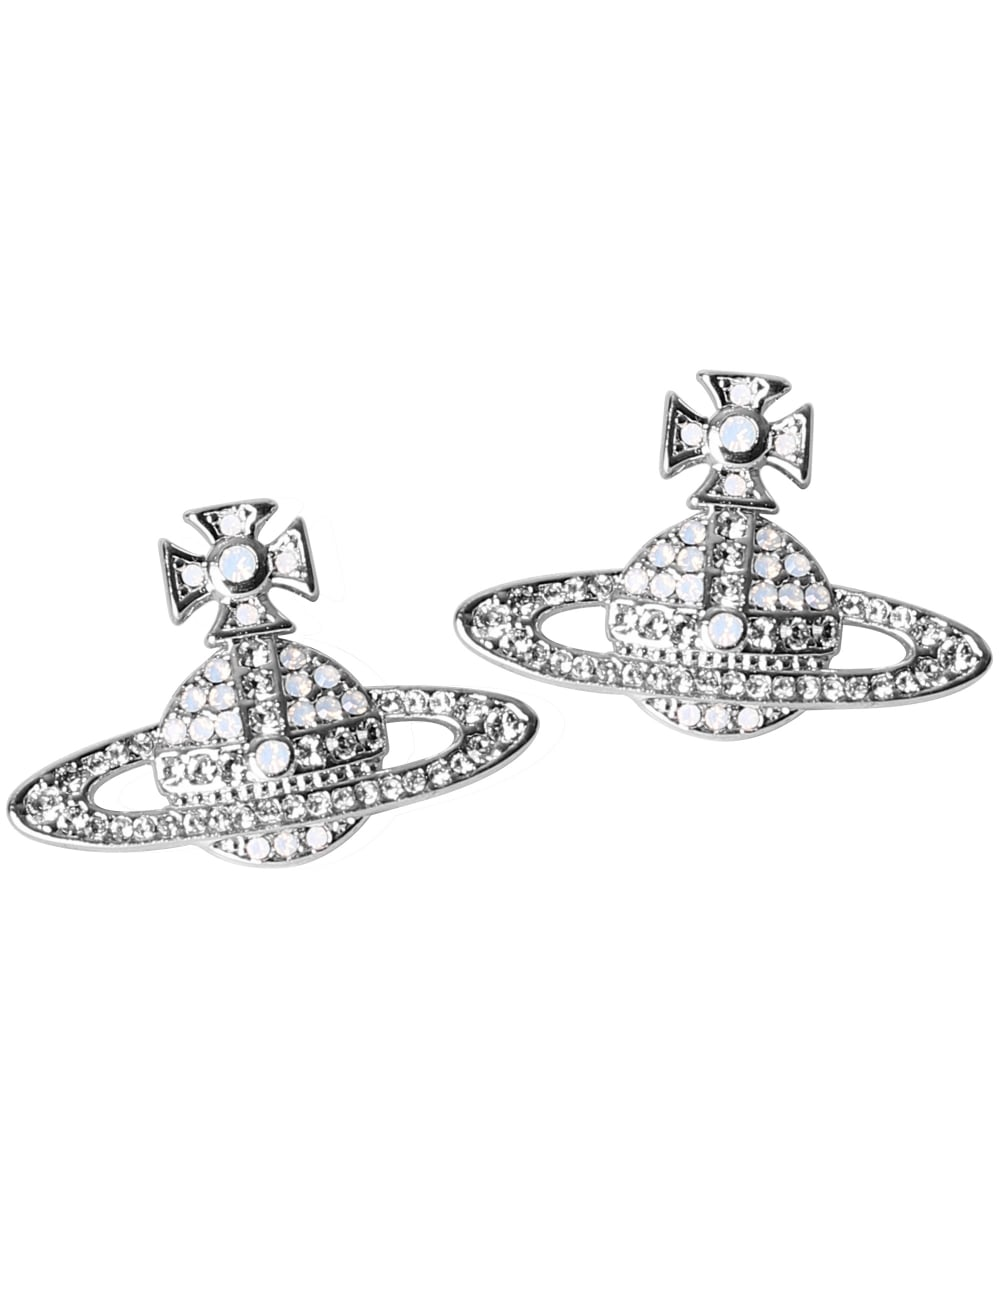 ccd9c8f20 Vivienne Westwood Kika Women's Crystal Orb Stud Earrings